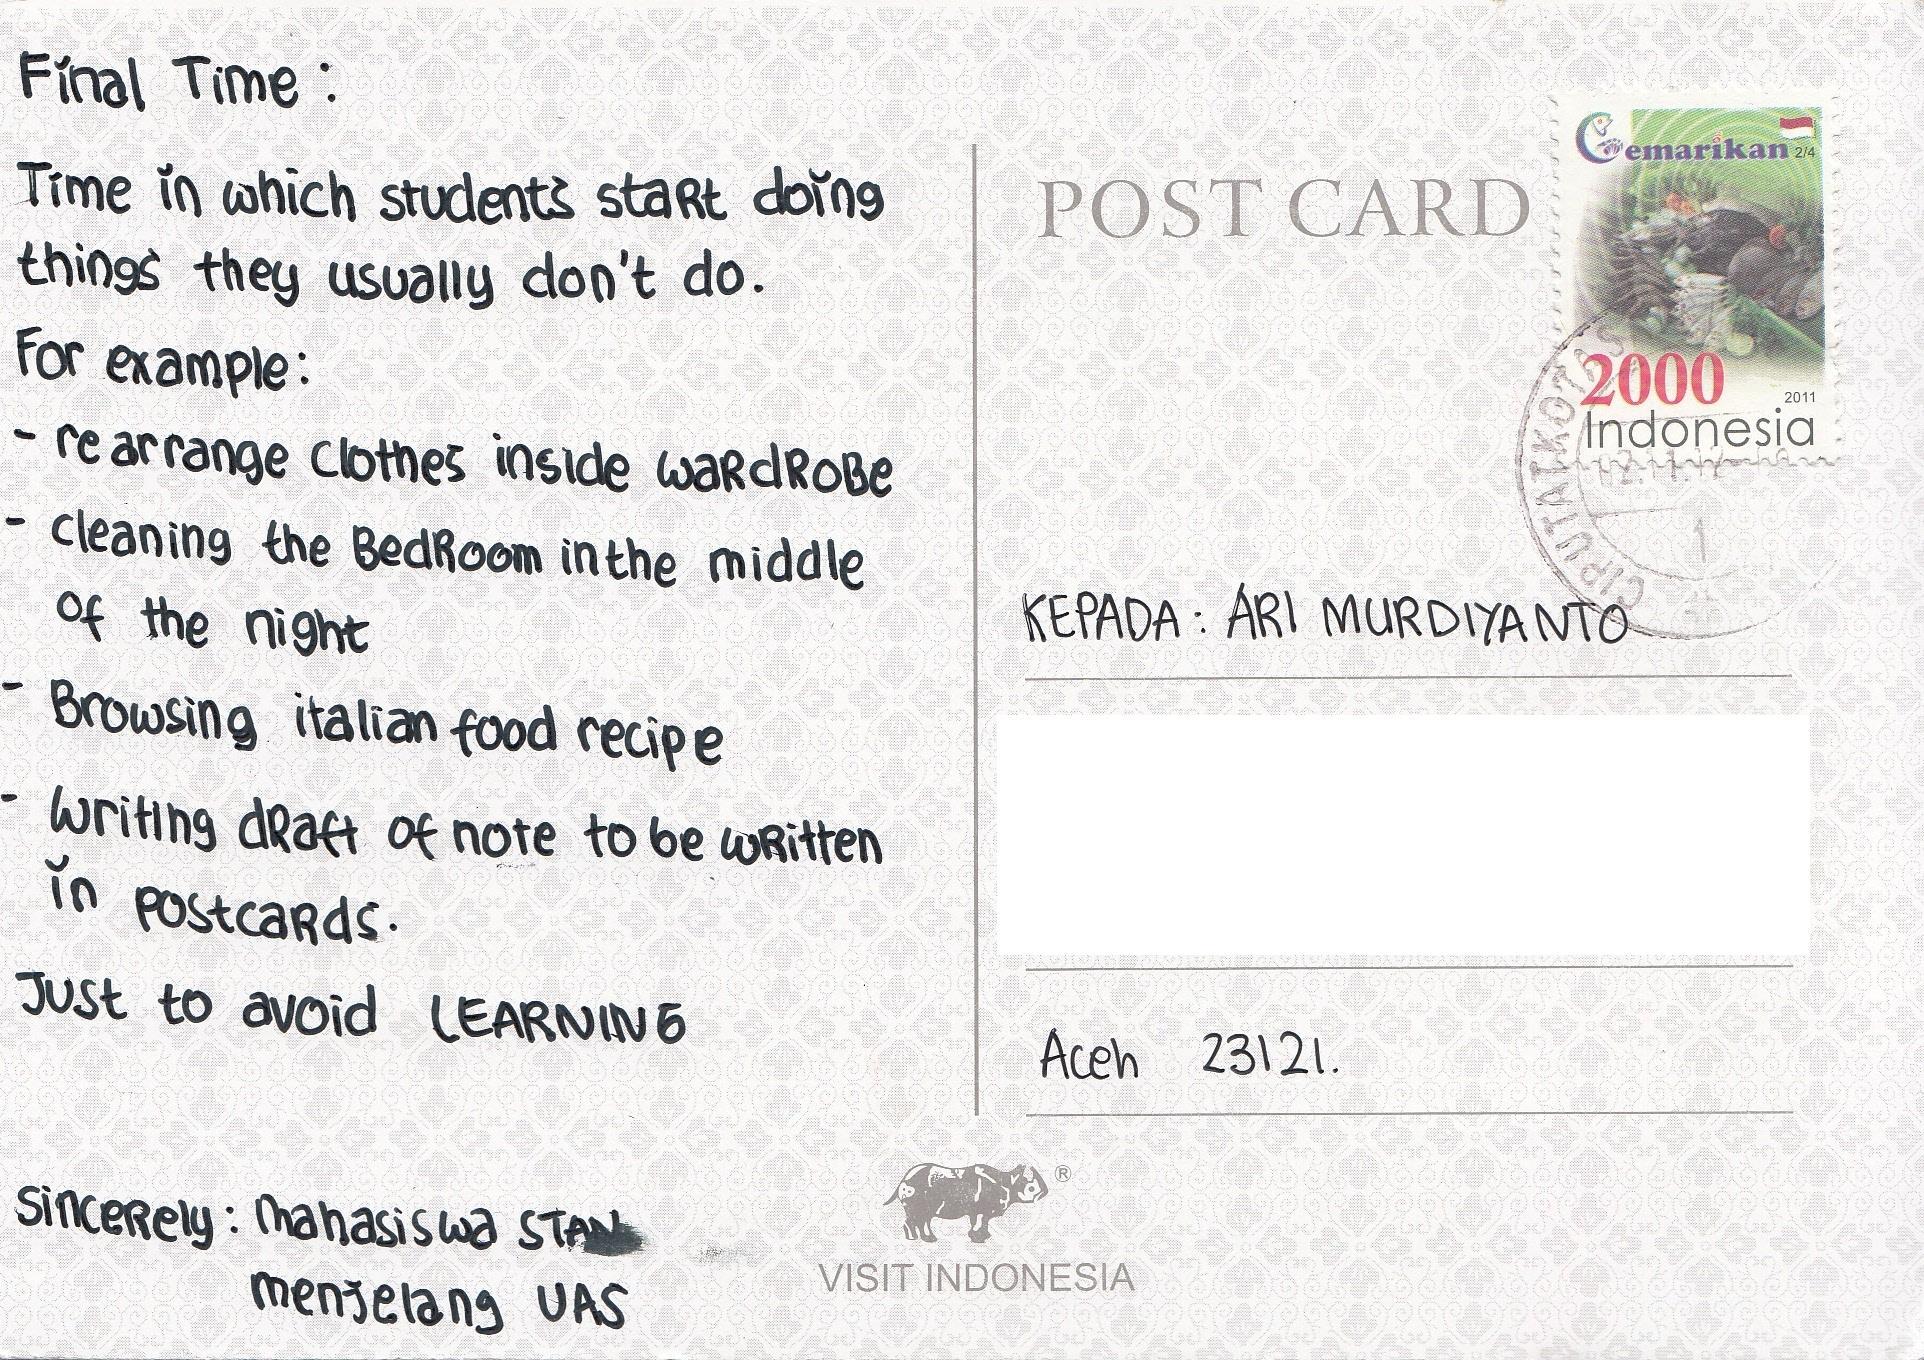 Tangkuban Perahu Postcard The Science Of Life